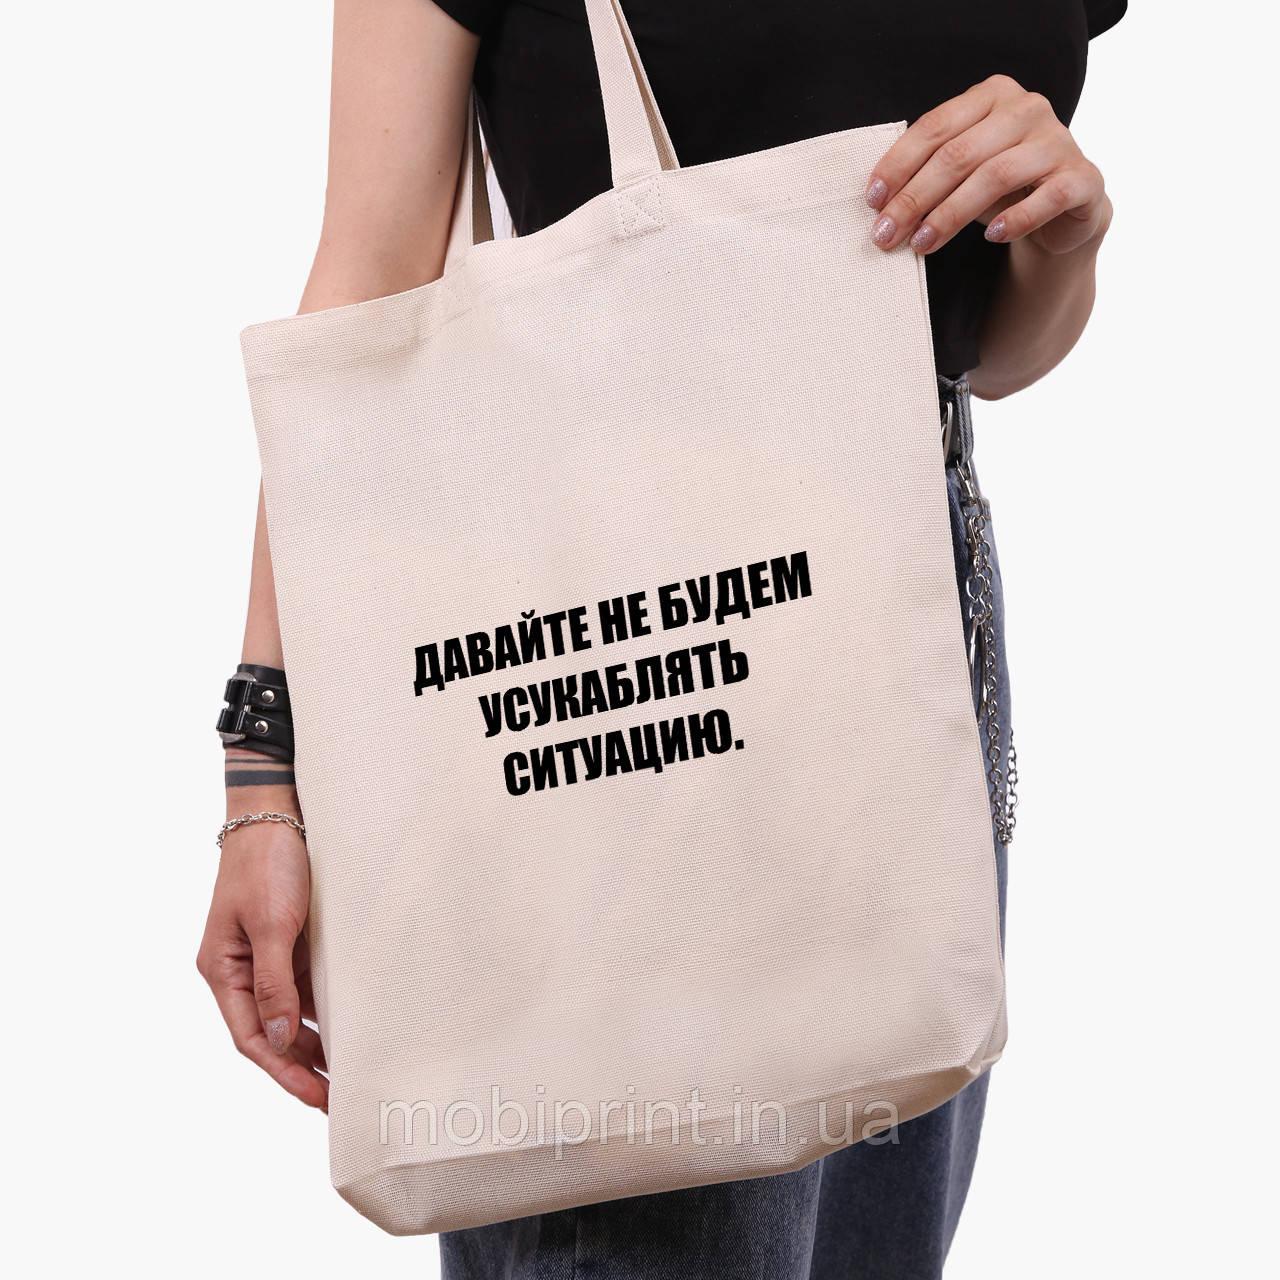 Еко сумка шоппер біла Усукаблять (9227-1784-1) экосумка шопер 41*39*8 см